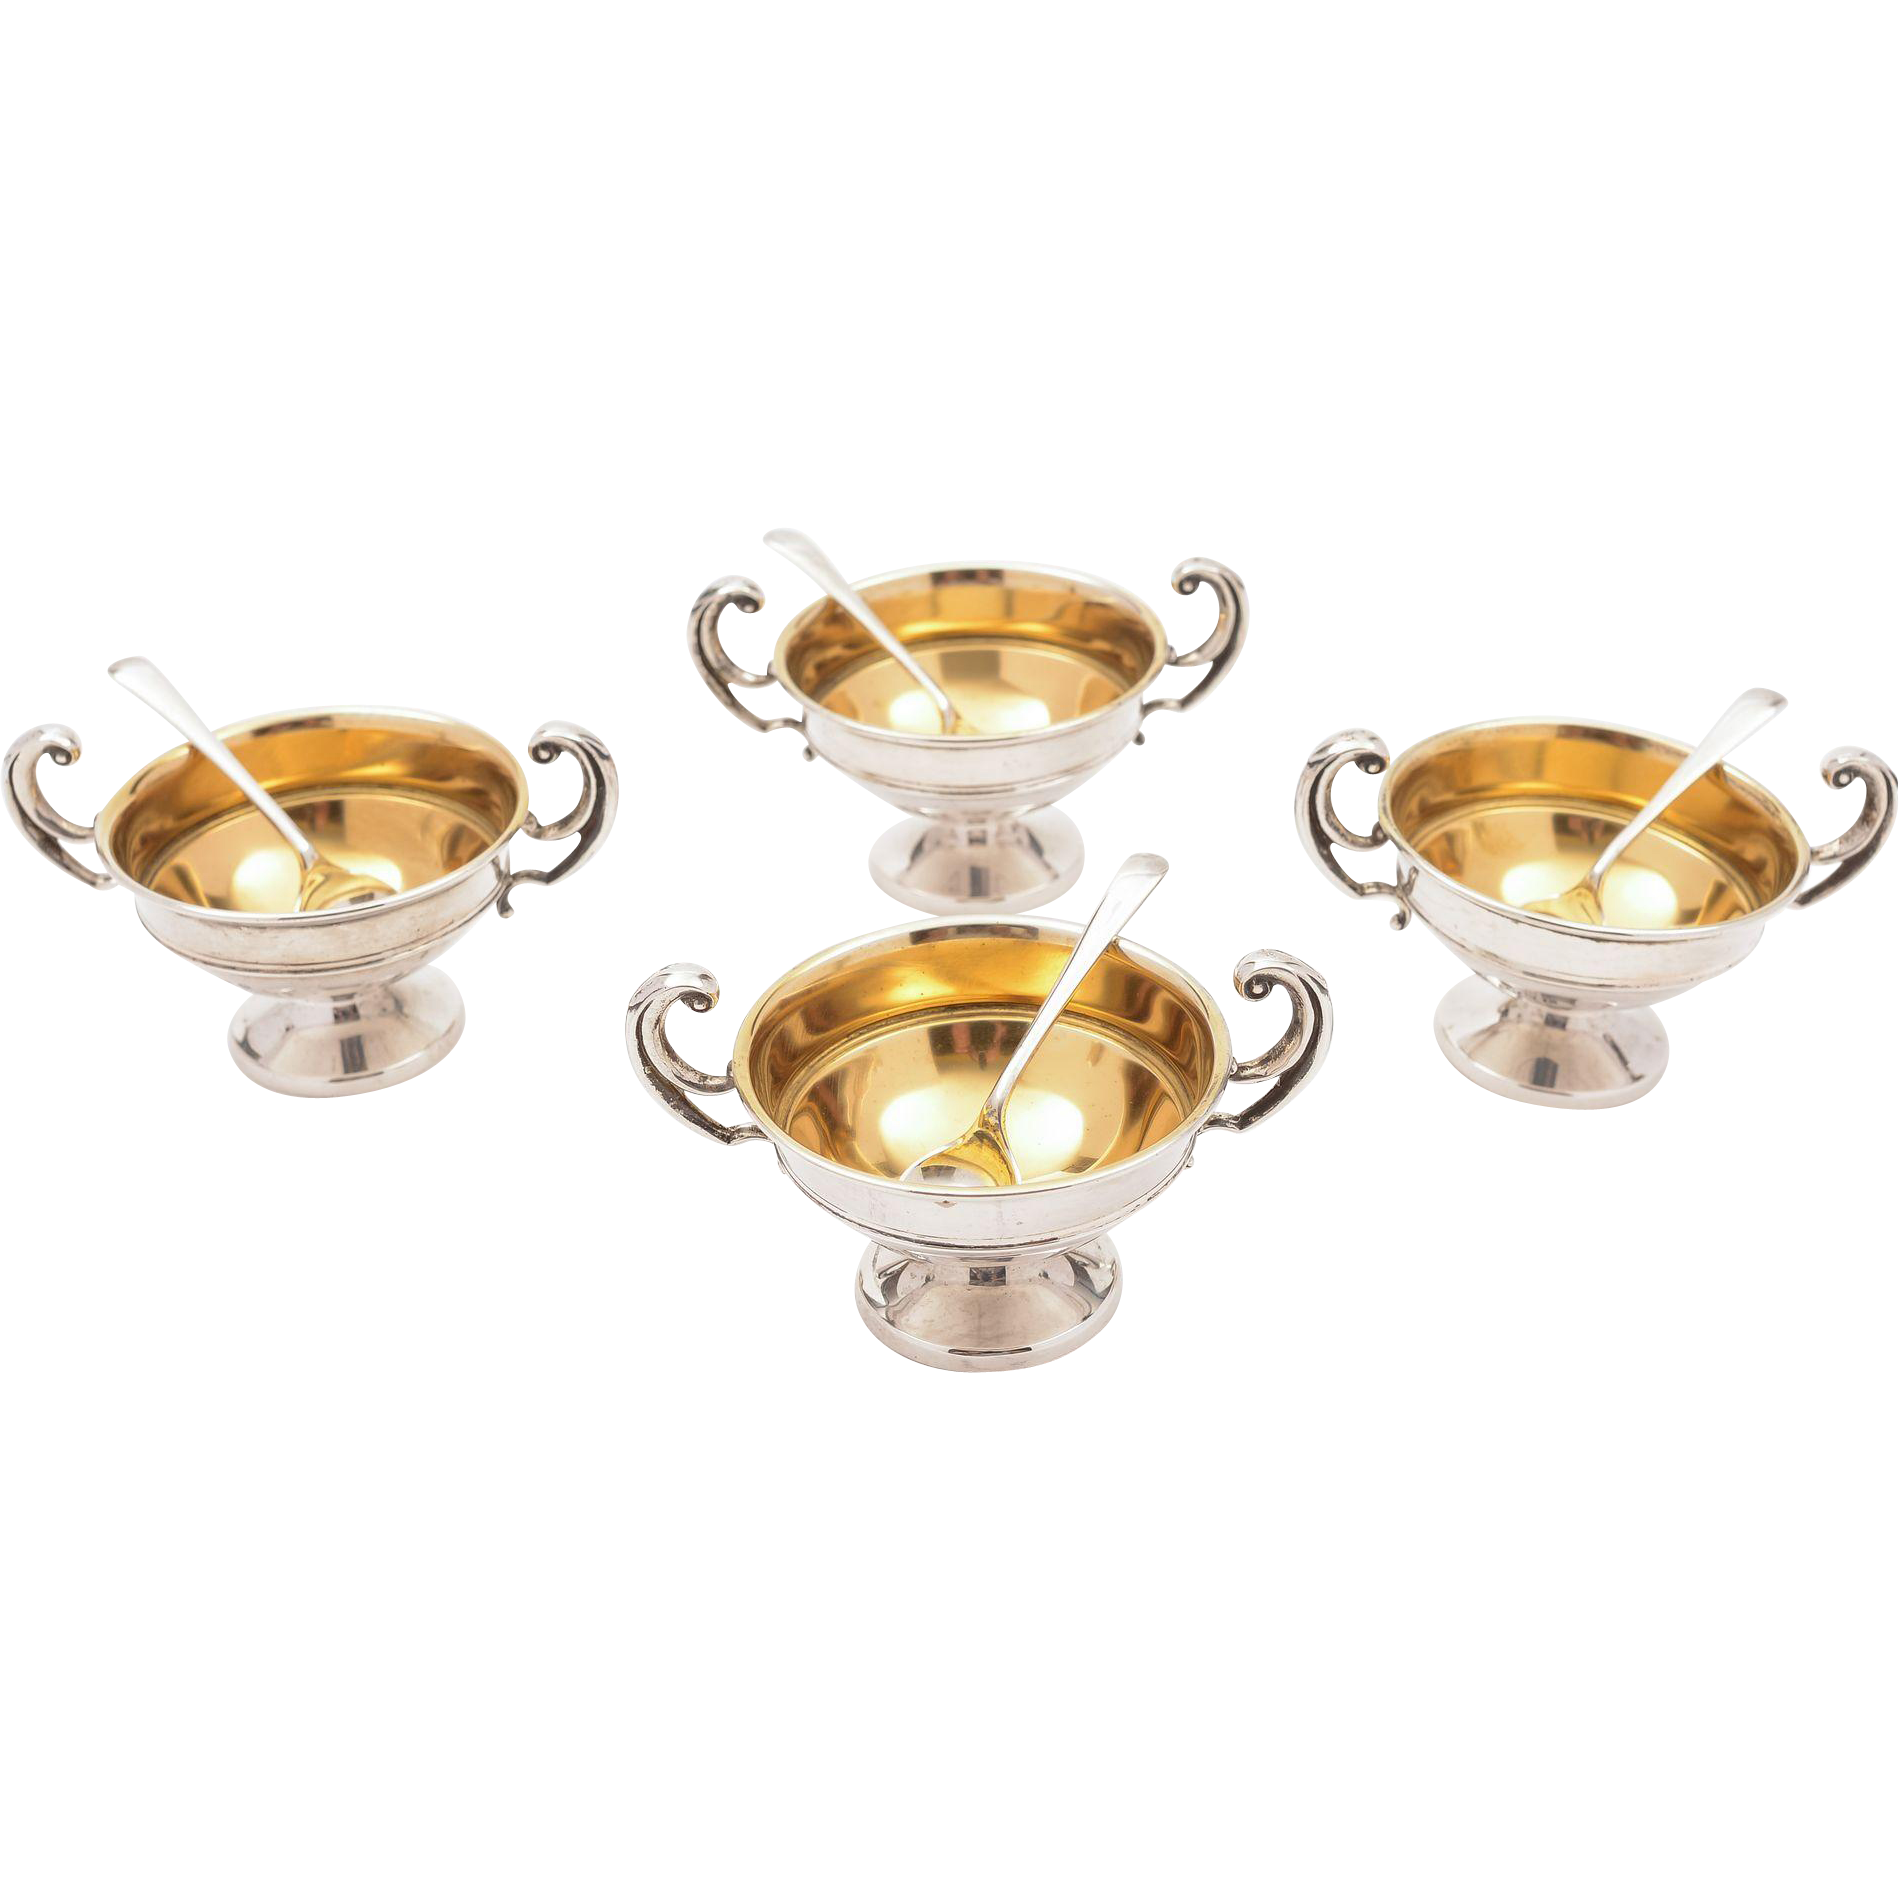 Set of 4 Silver Trophy Salts, Birmingham 1929